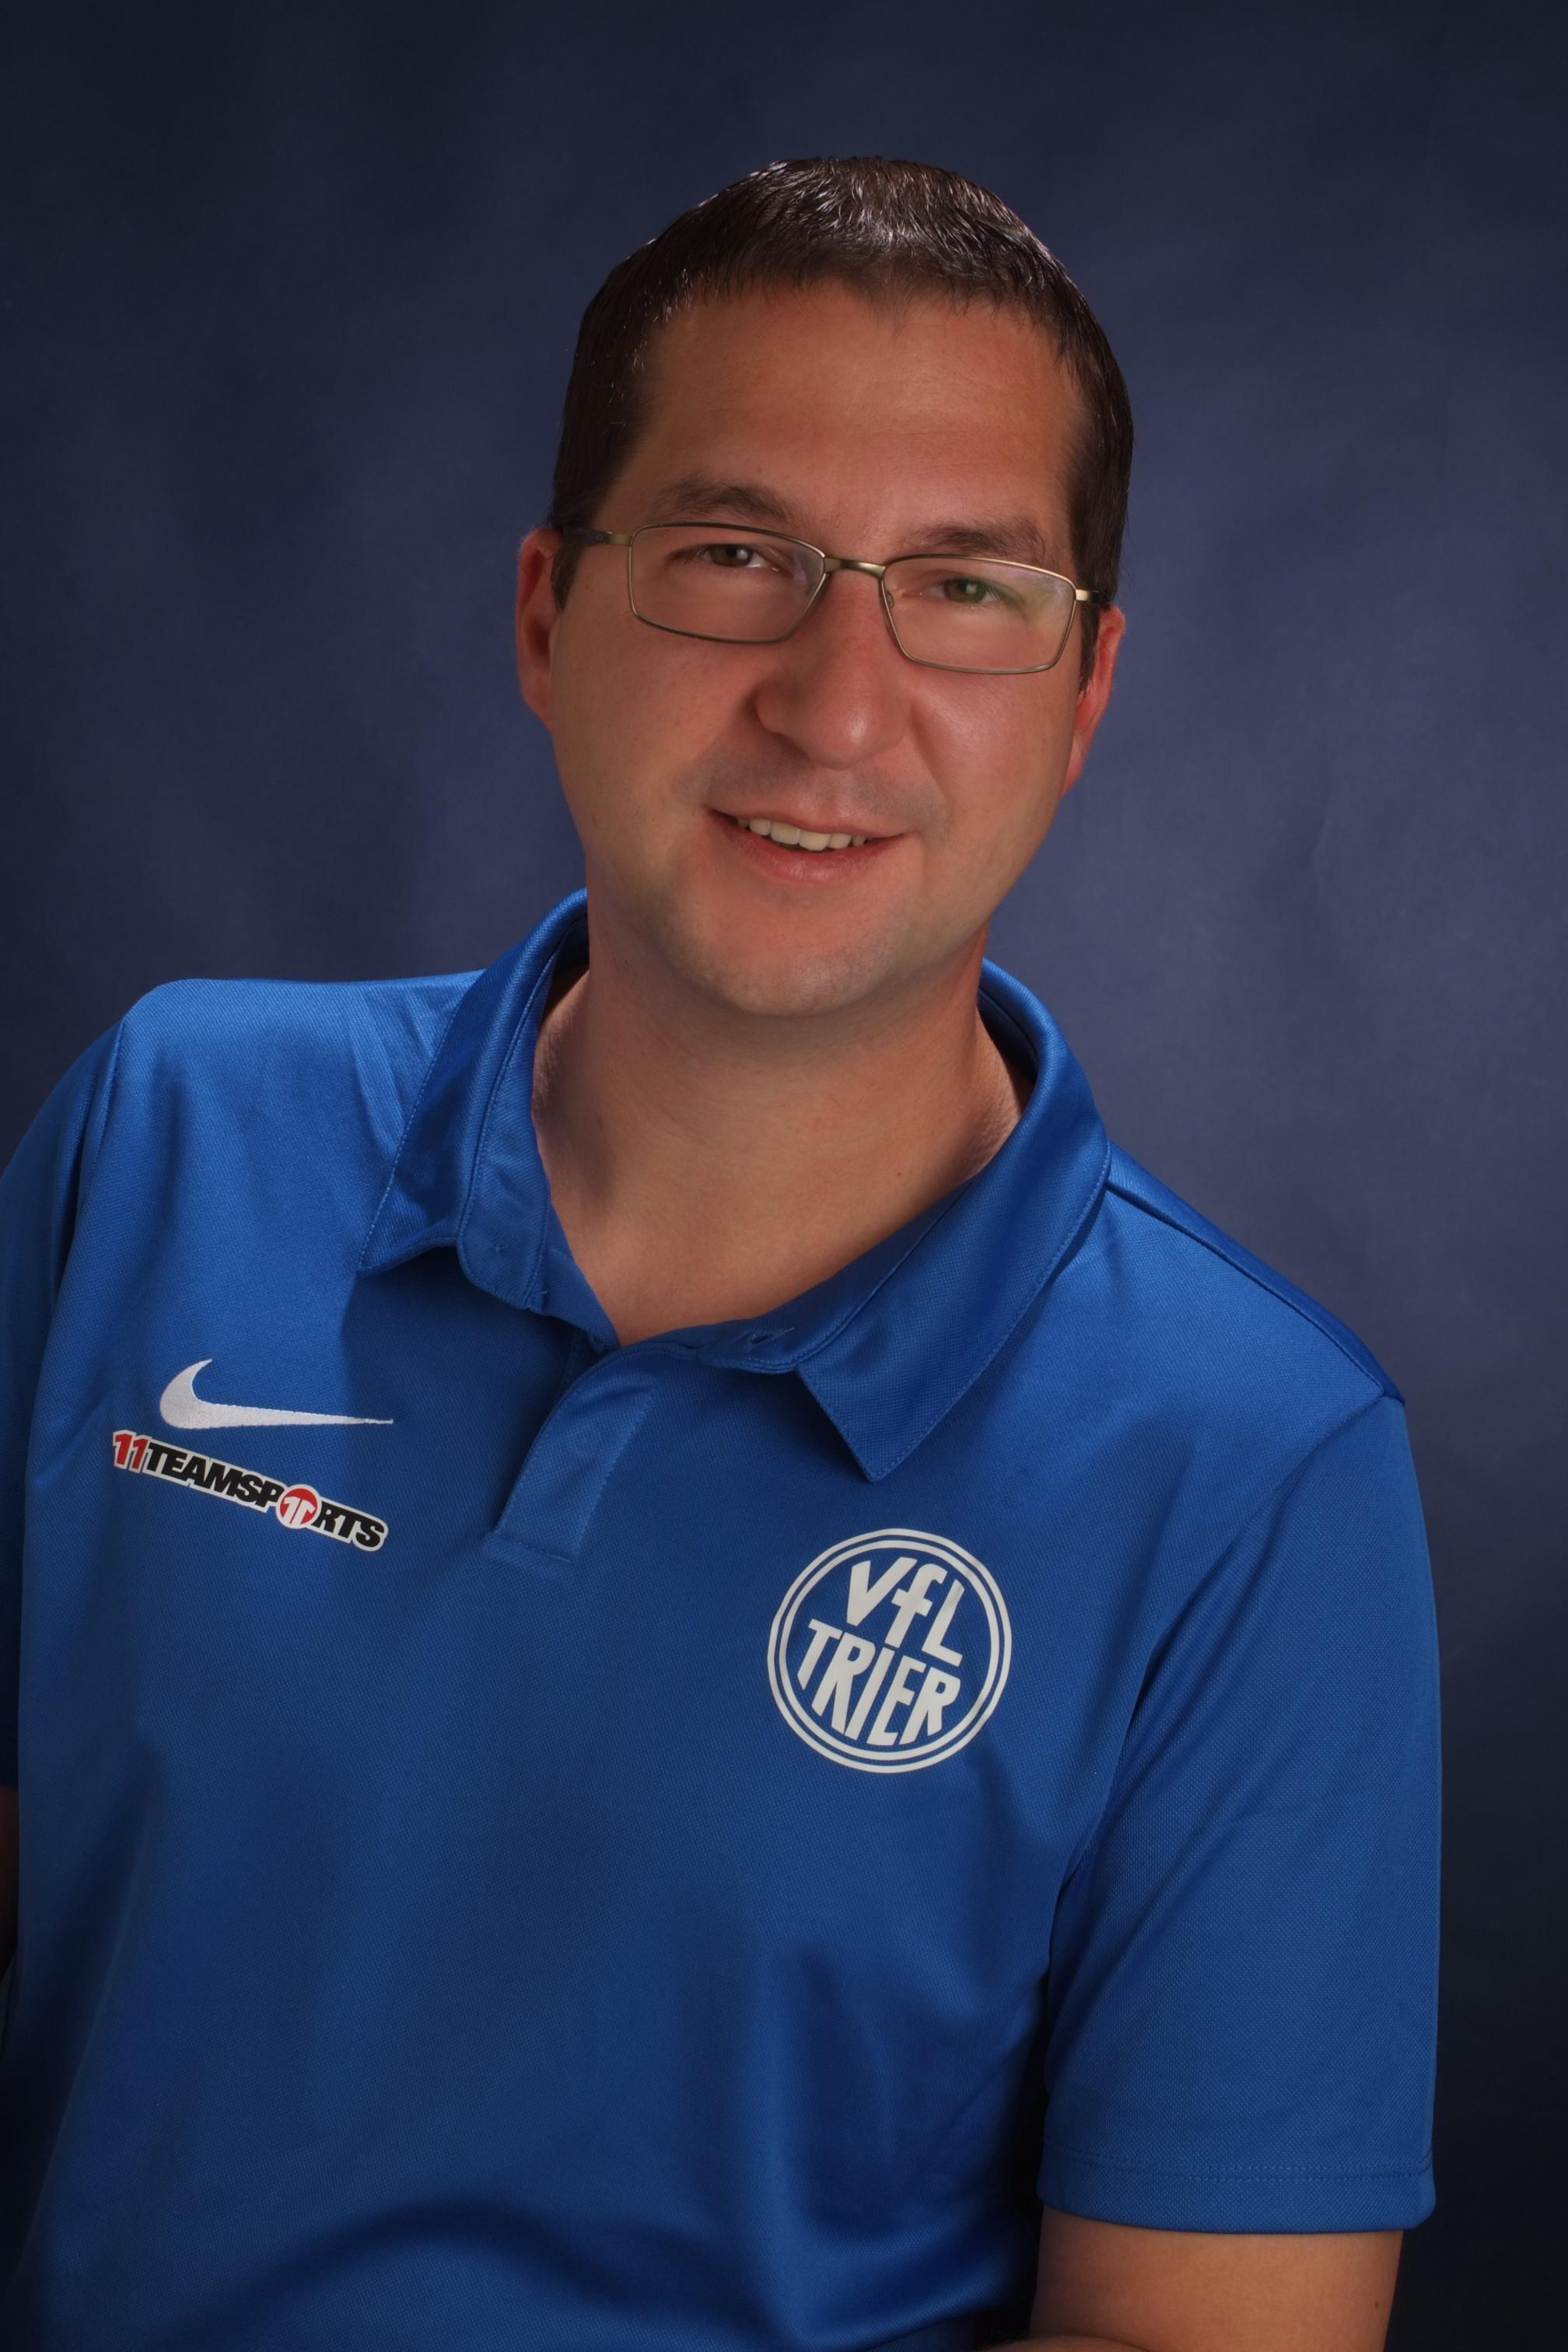 Andreas Elsner